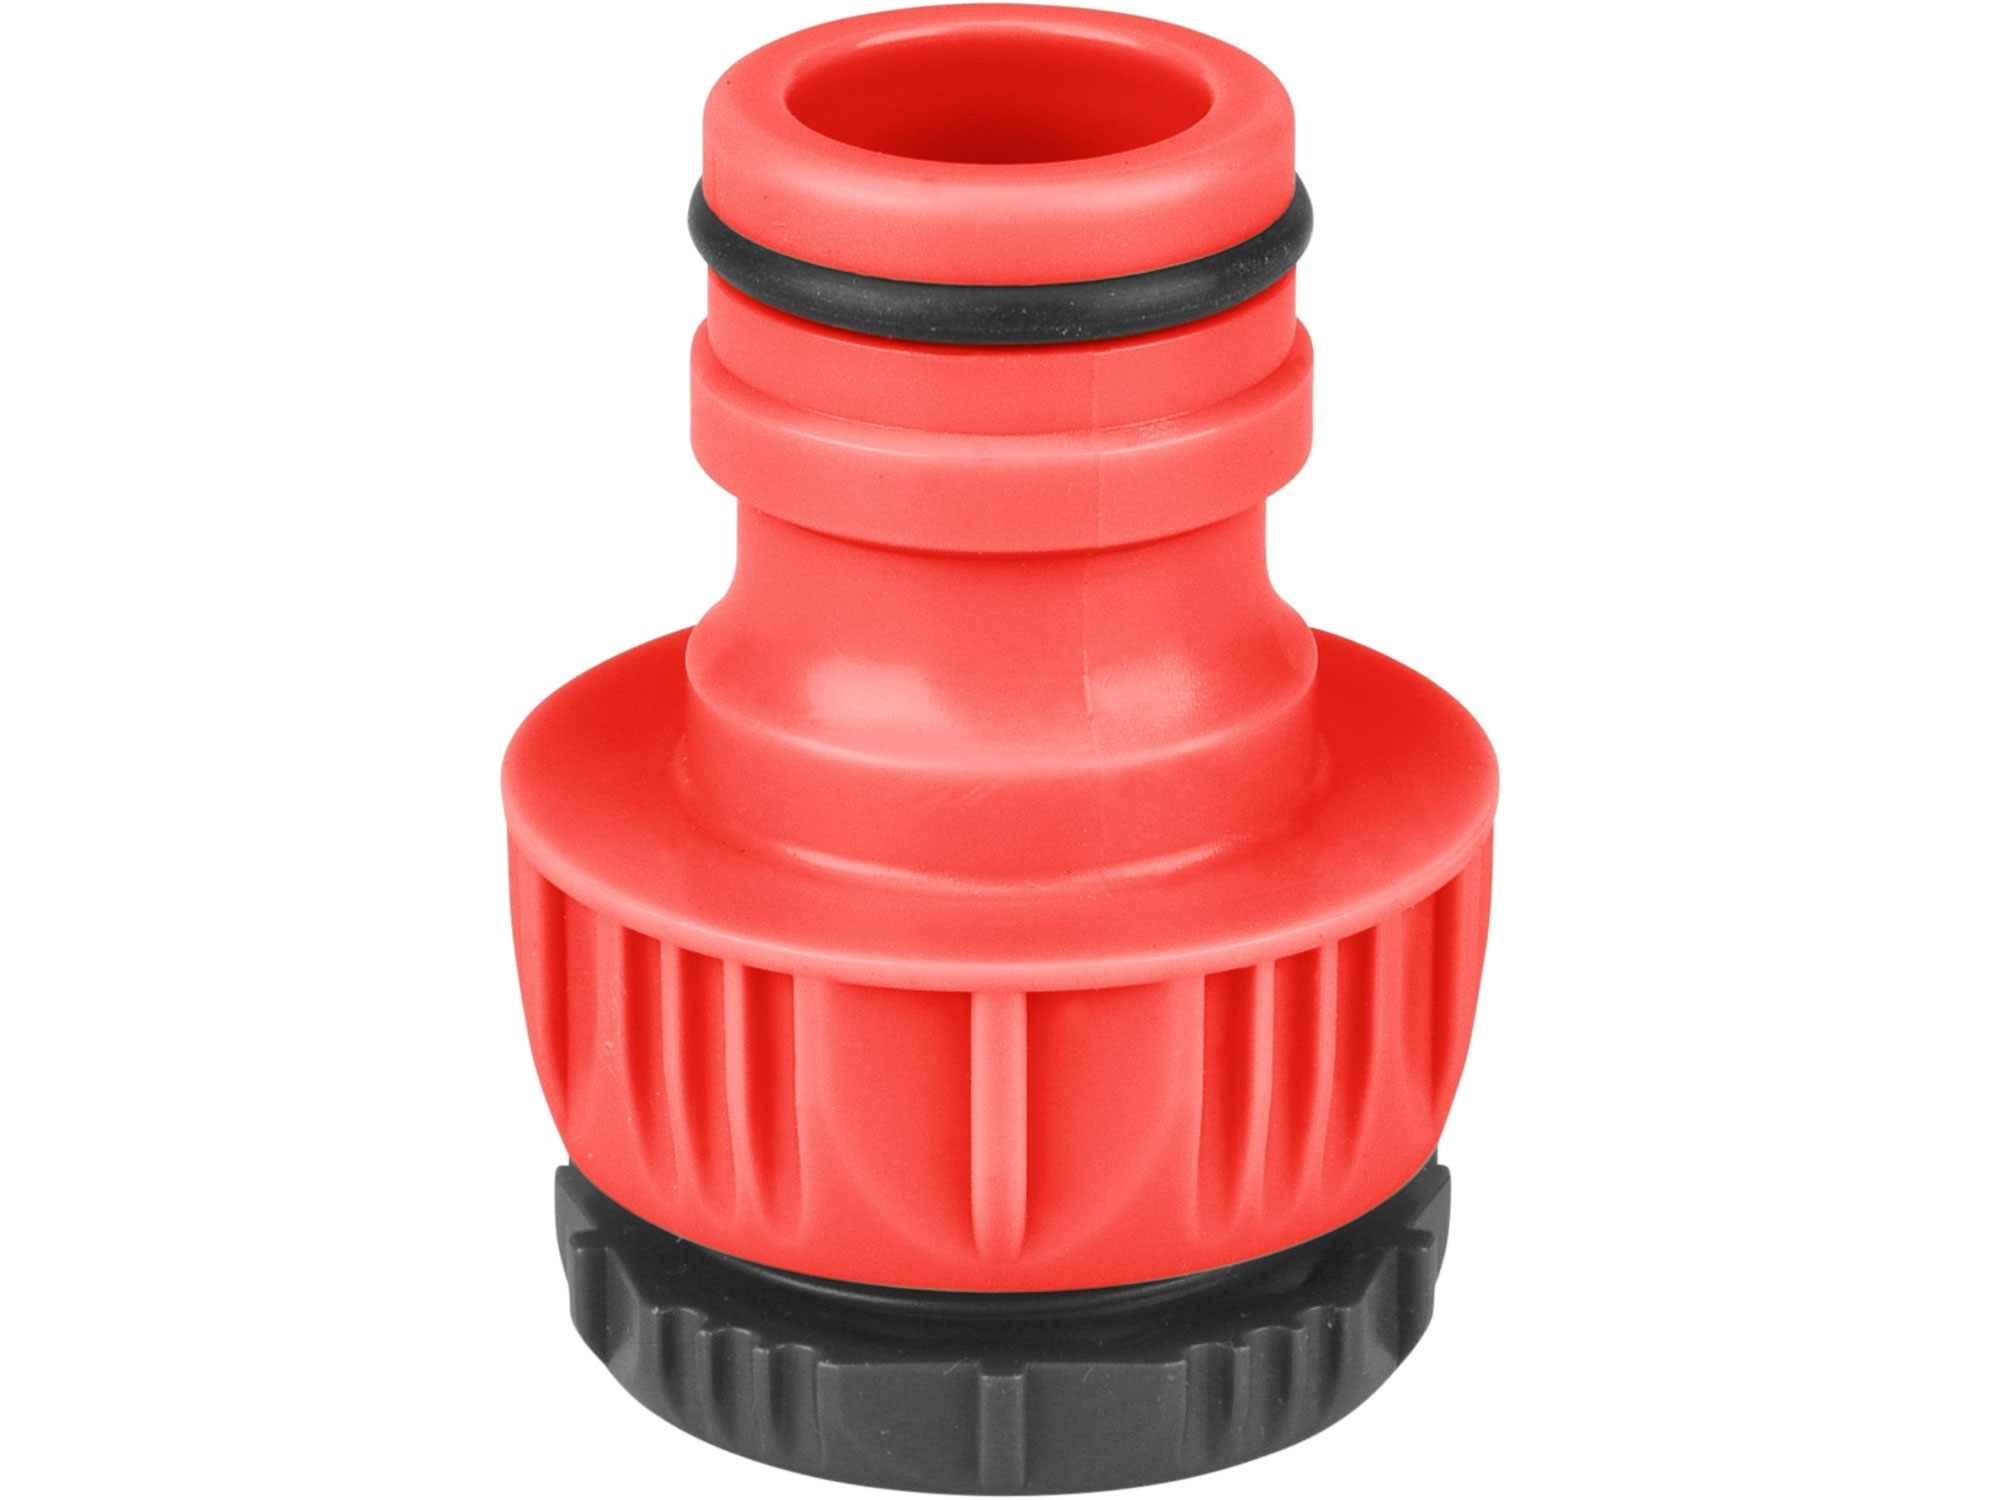 "adaptér na kohoutek vnitř. závit na konektor 1"" systém, 1""-3/4"" vnitřní závit na 1"" konektor"